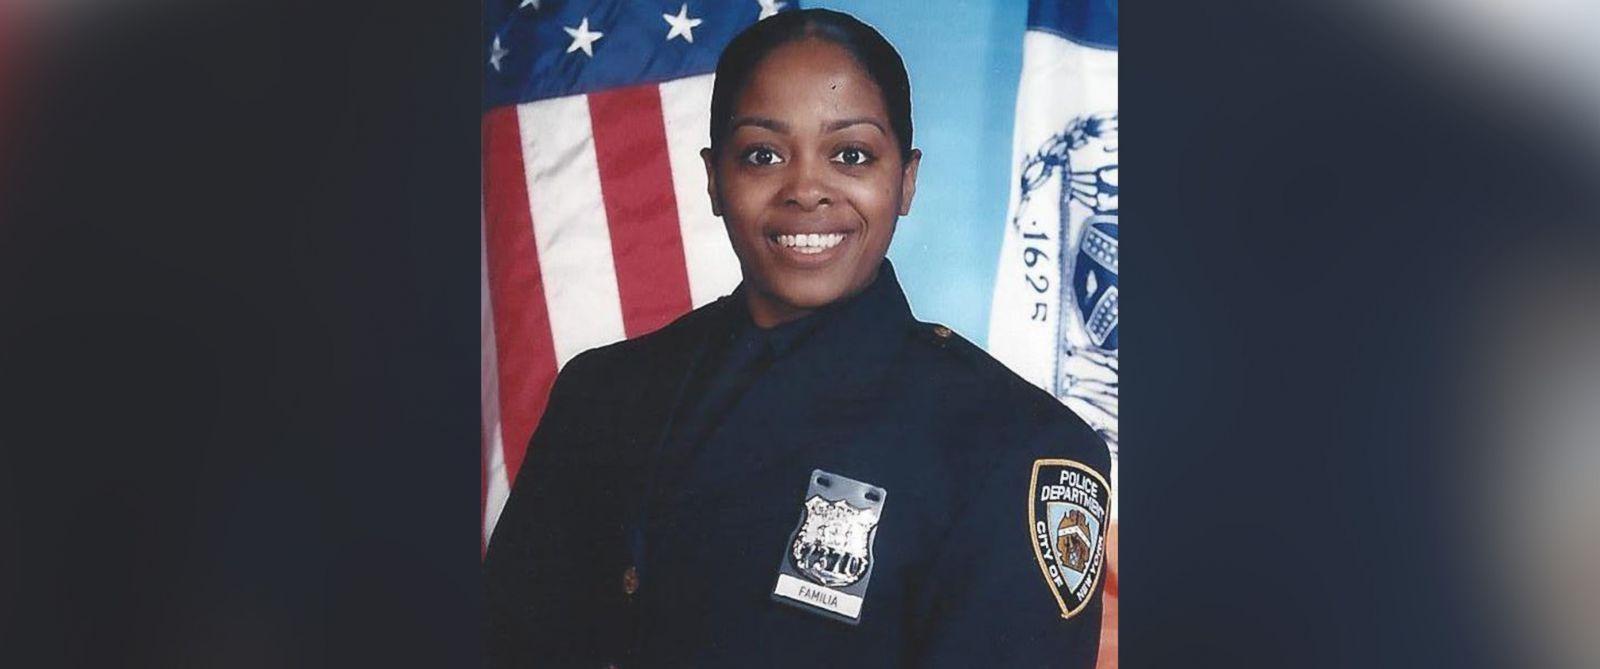 HT-NYPDOfficerFamilia-jrl-170705_31x13_1